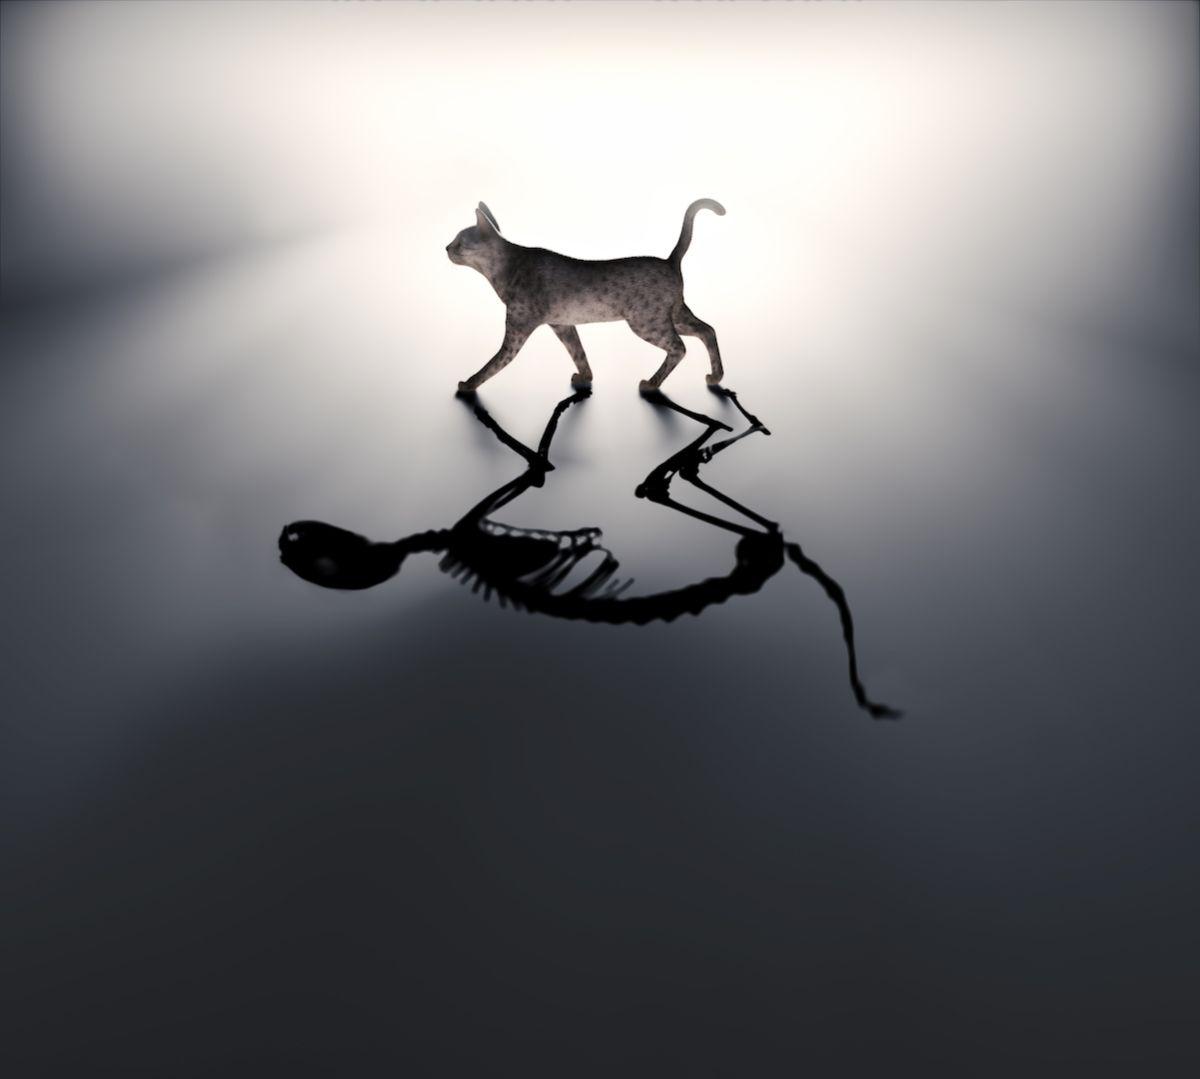 Schrödinger's cat: The favorite, misunderstood pet of quantum mechanics